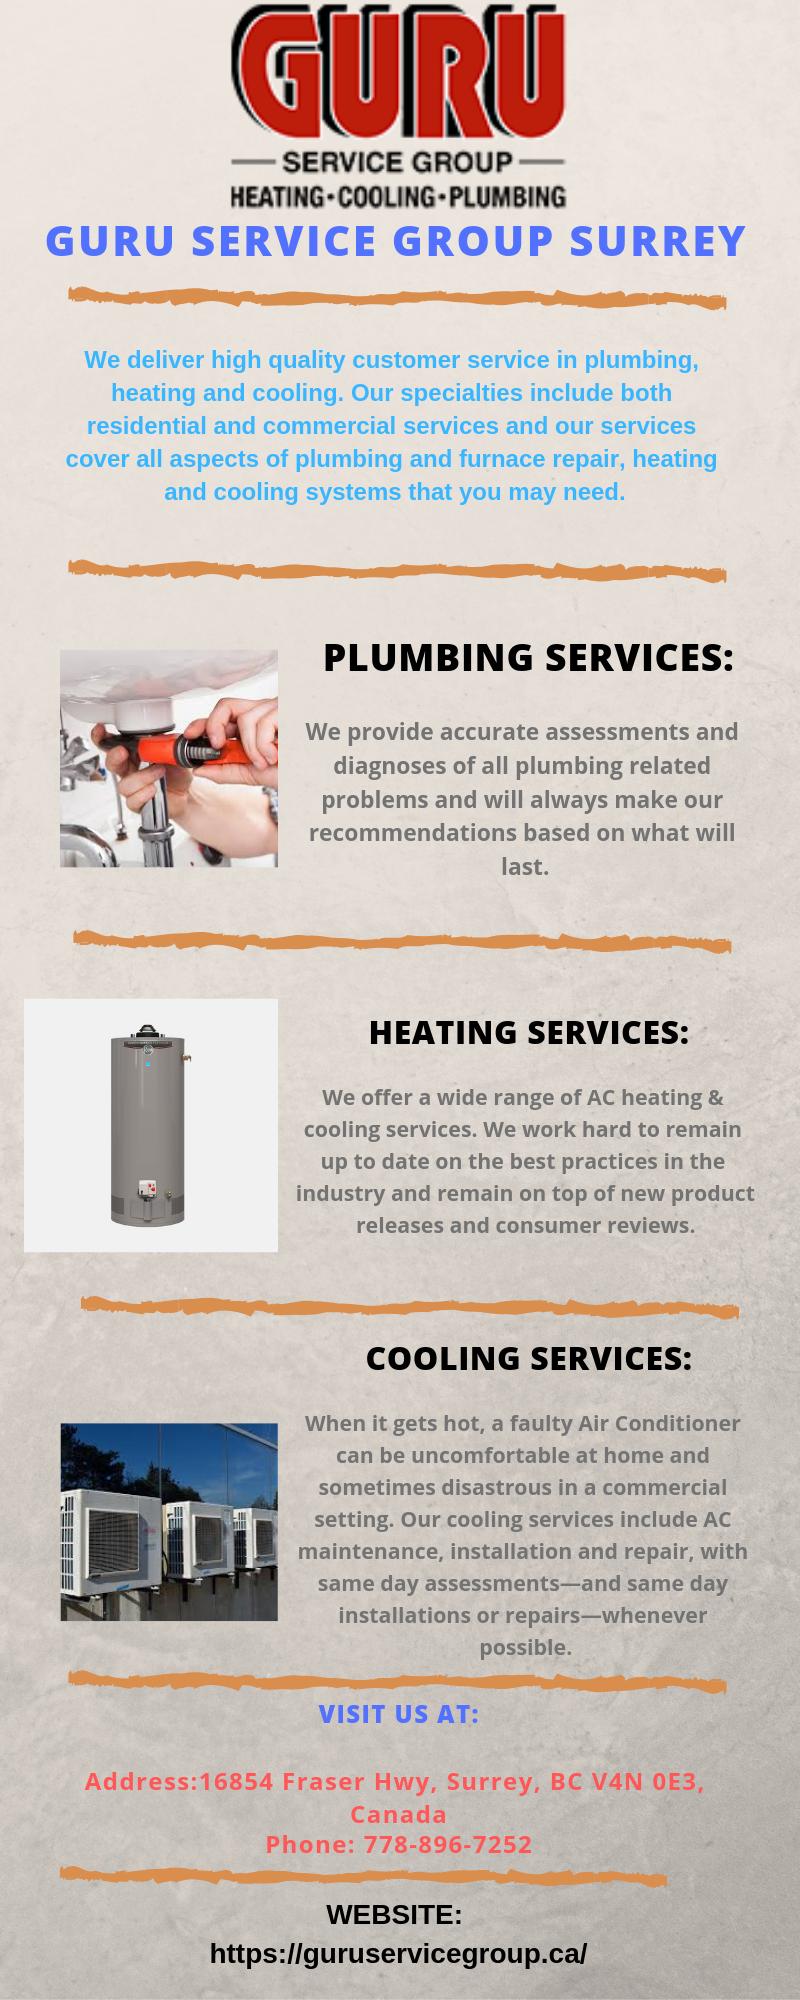 Furnace Repair And Installation Surrey Bc 778 896 7252